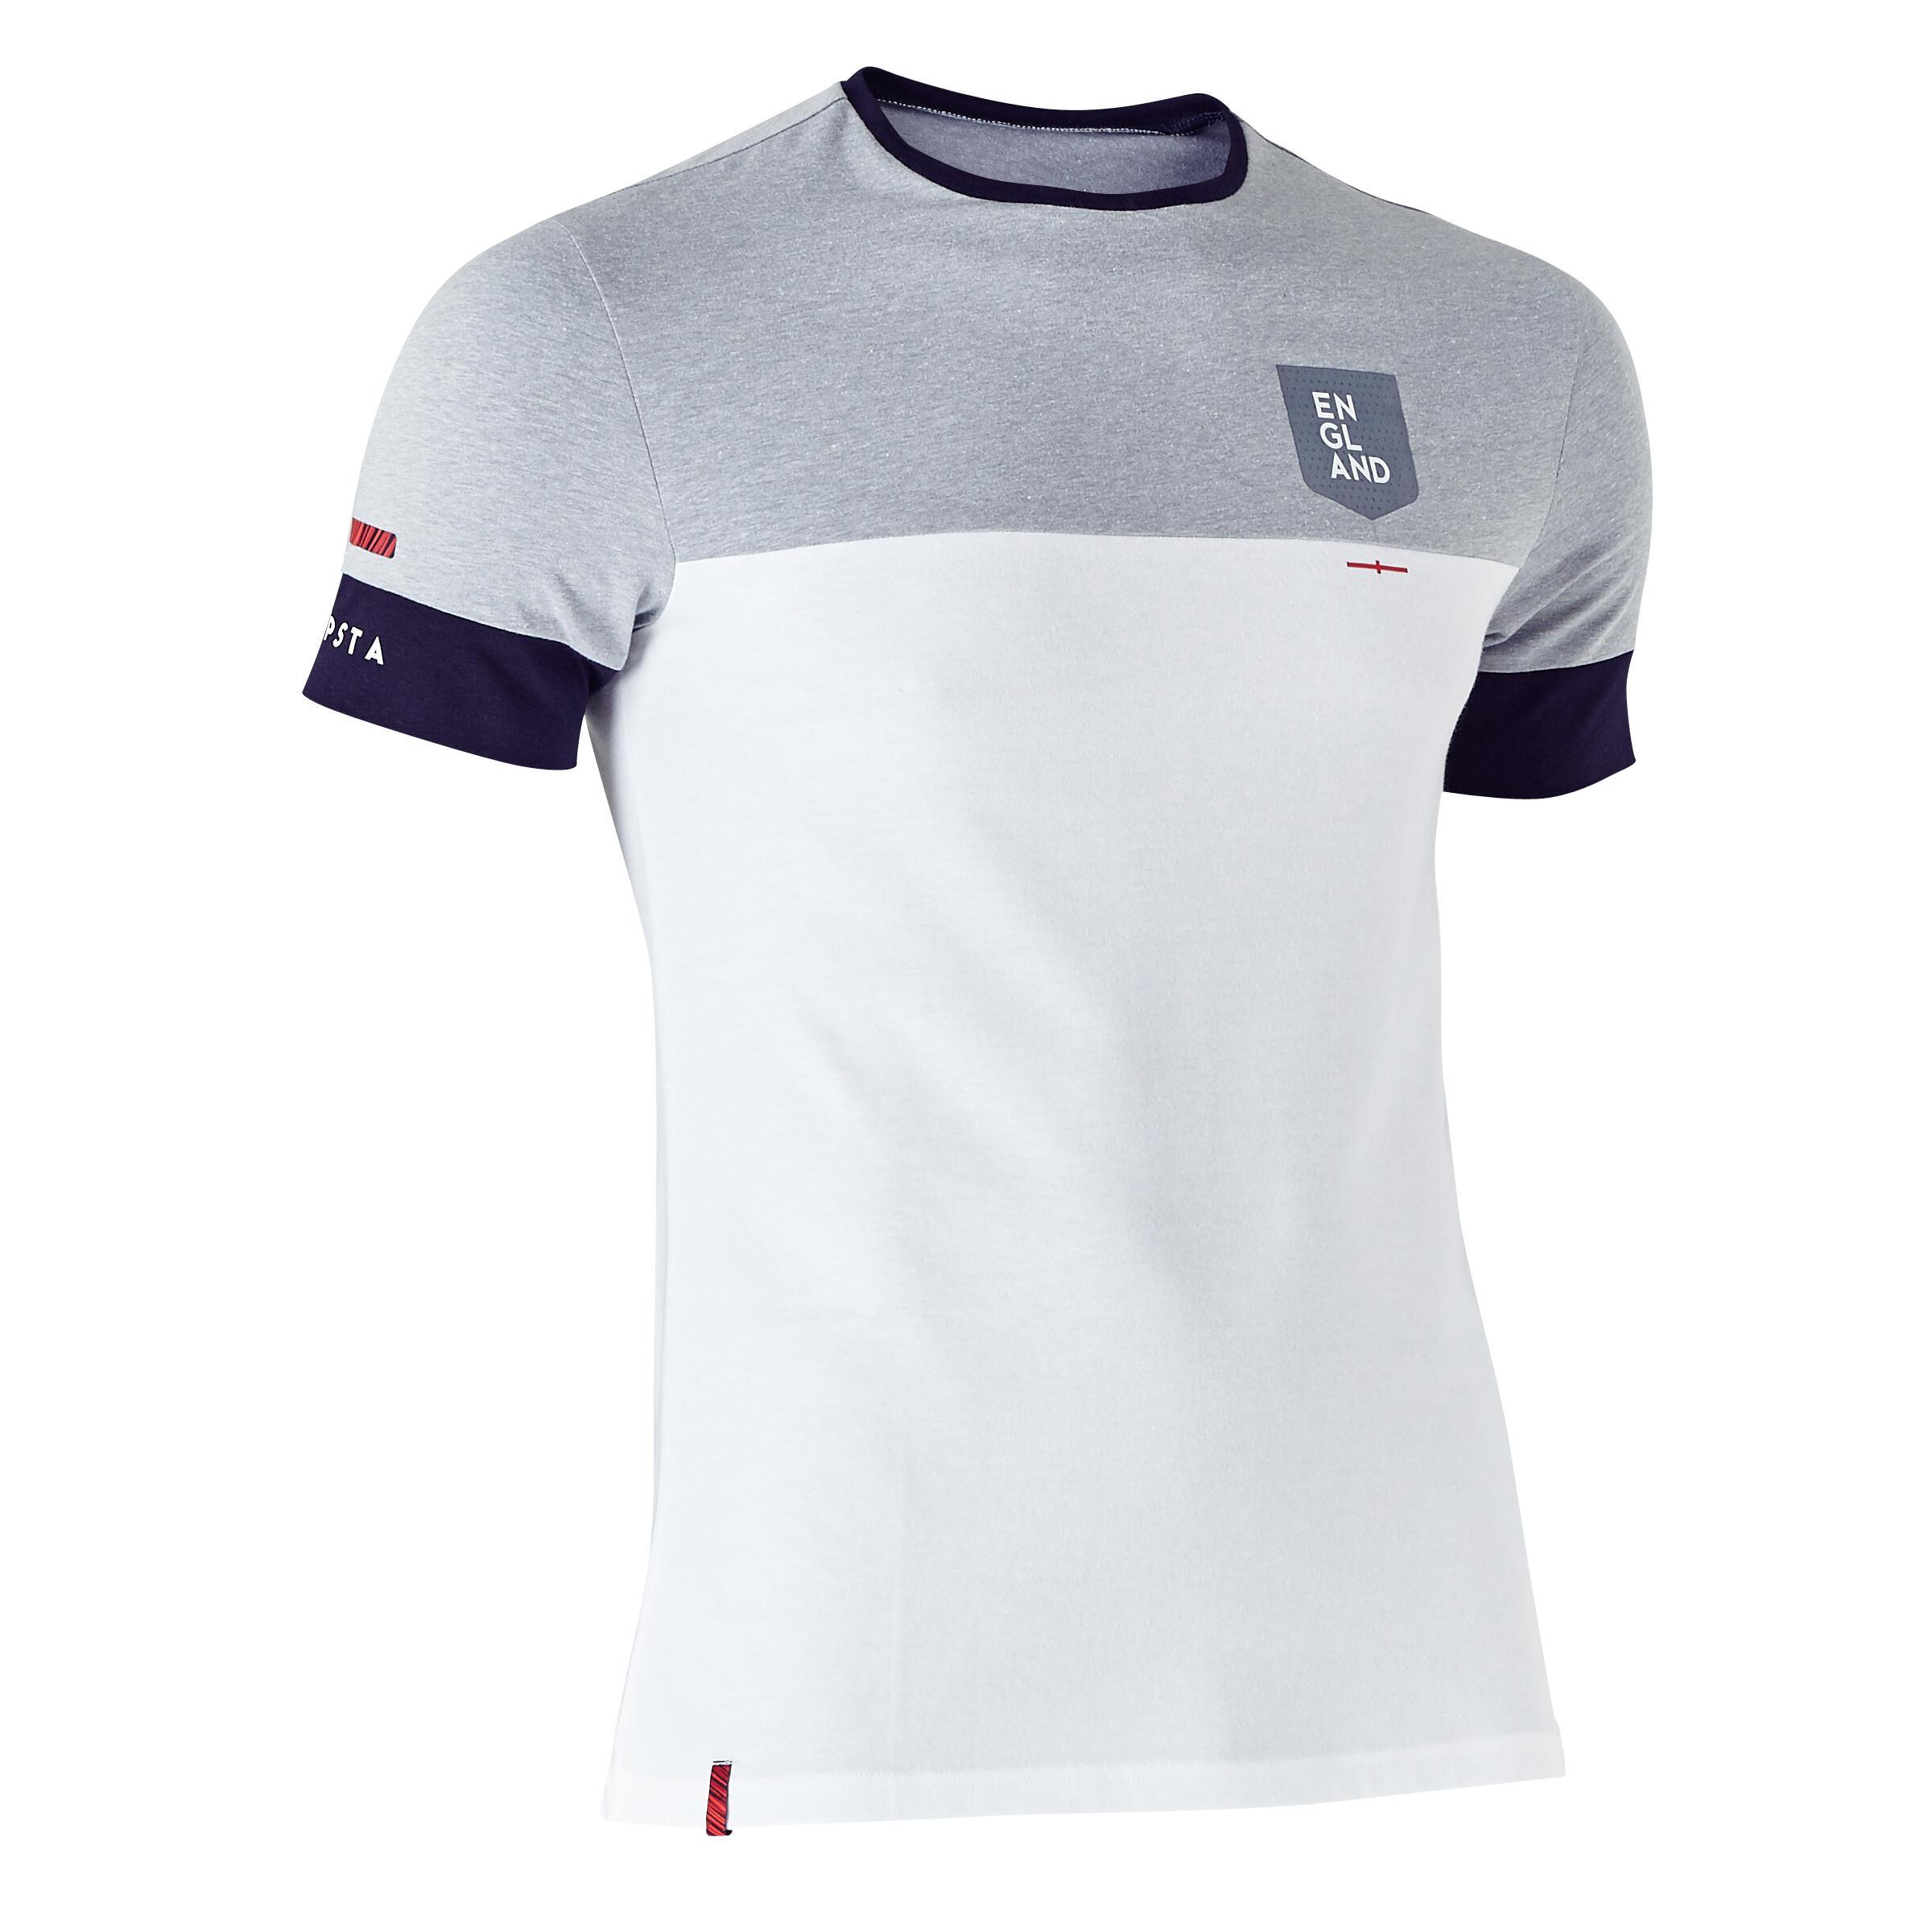 Kipsta Voetbalshirt FF100 voor volwassenen Engeland